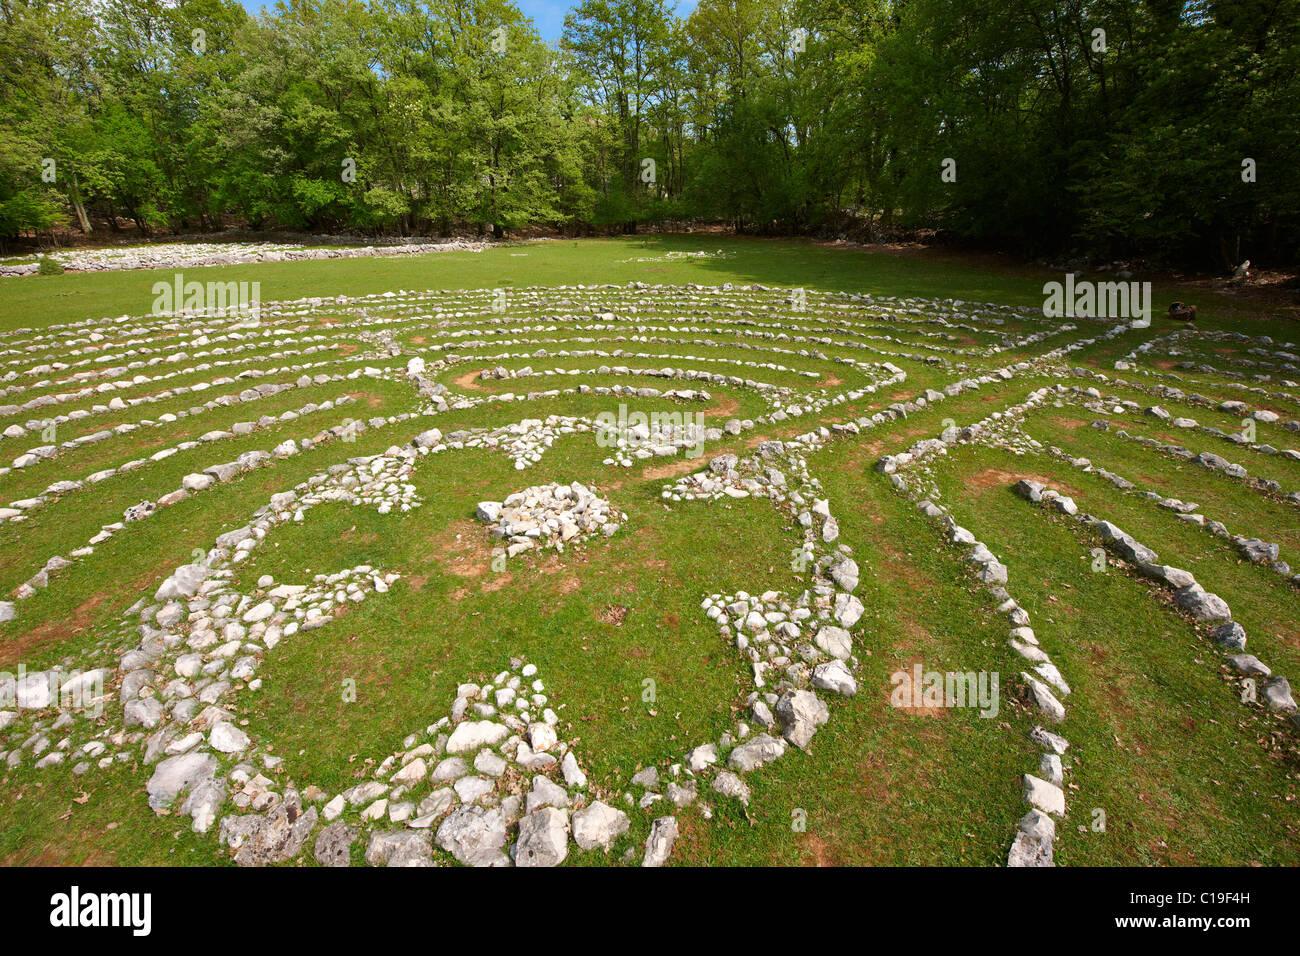 Vesna's Labyrinth - Tramuntana Forest; Cres Island Croatia - Stock Image